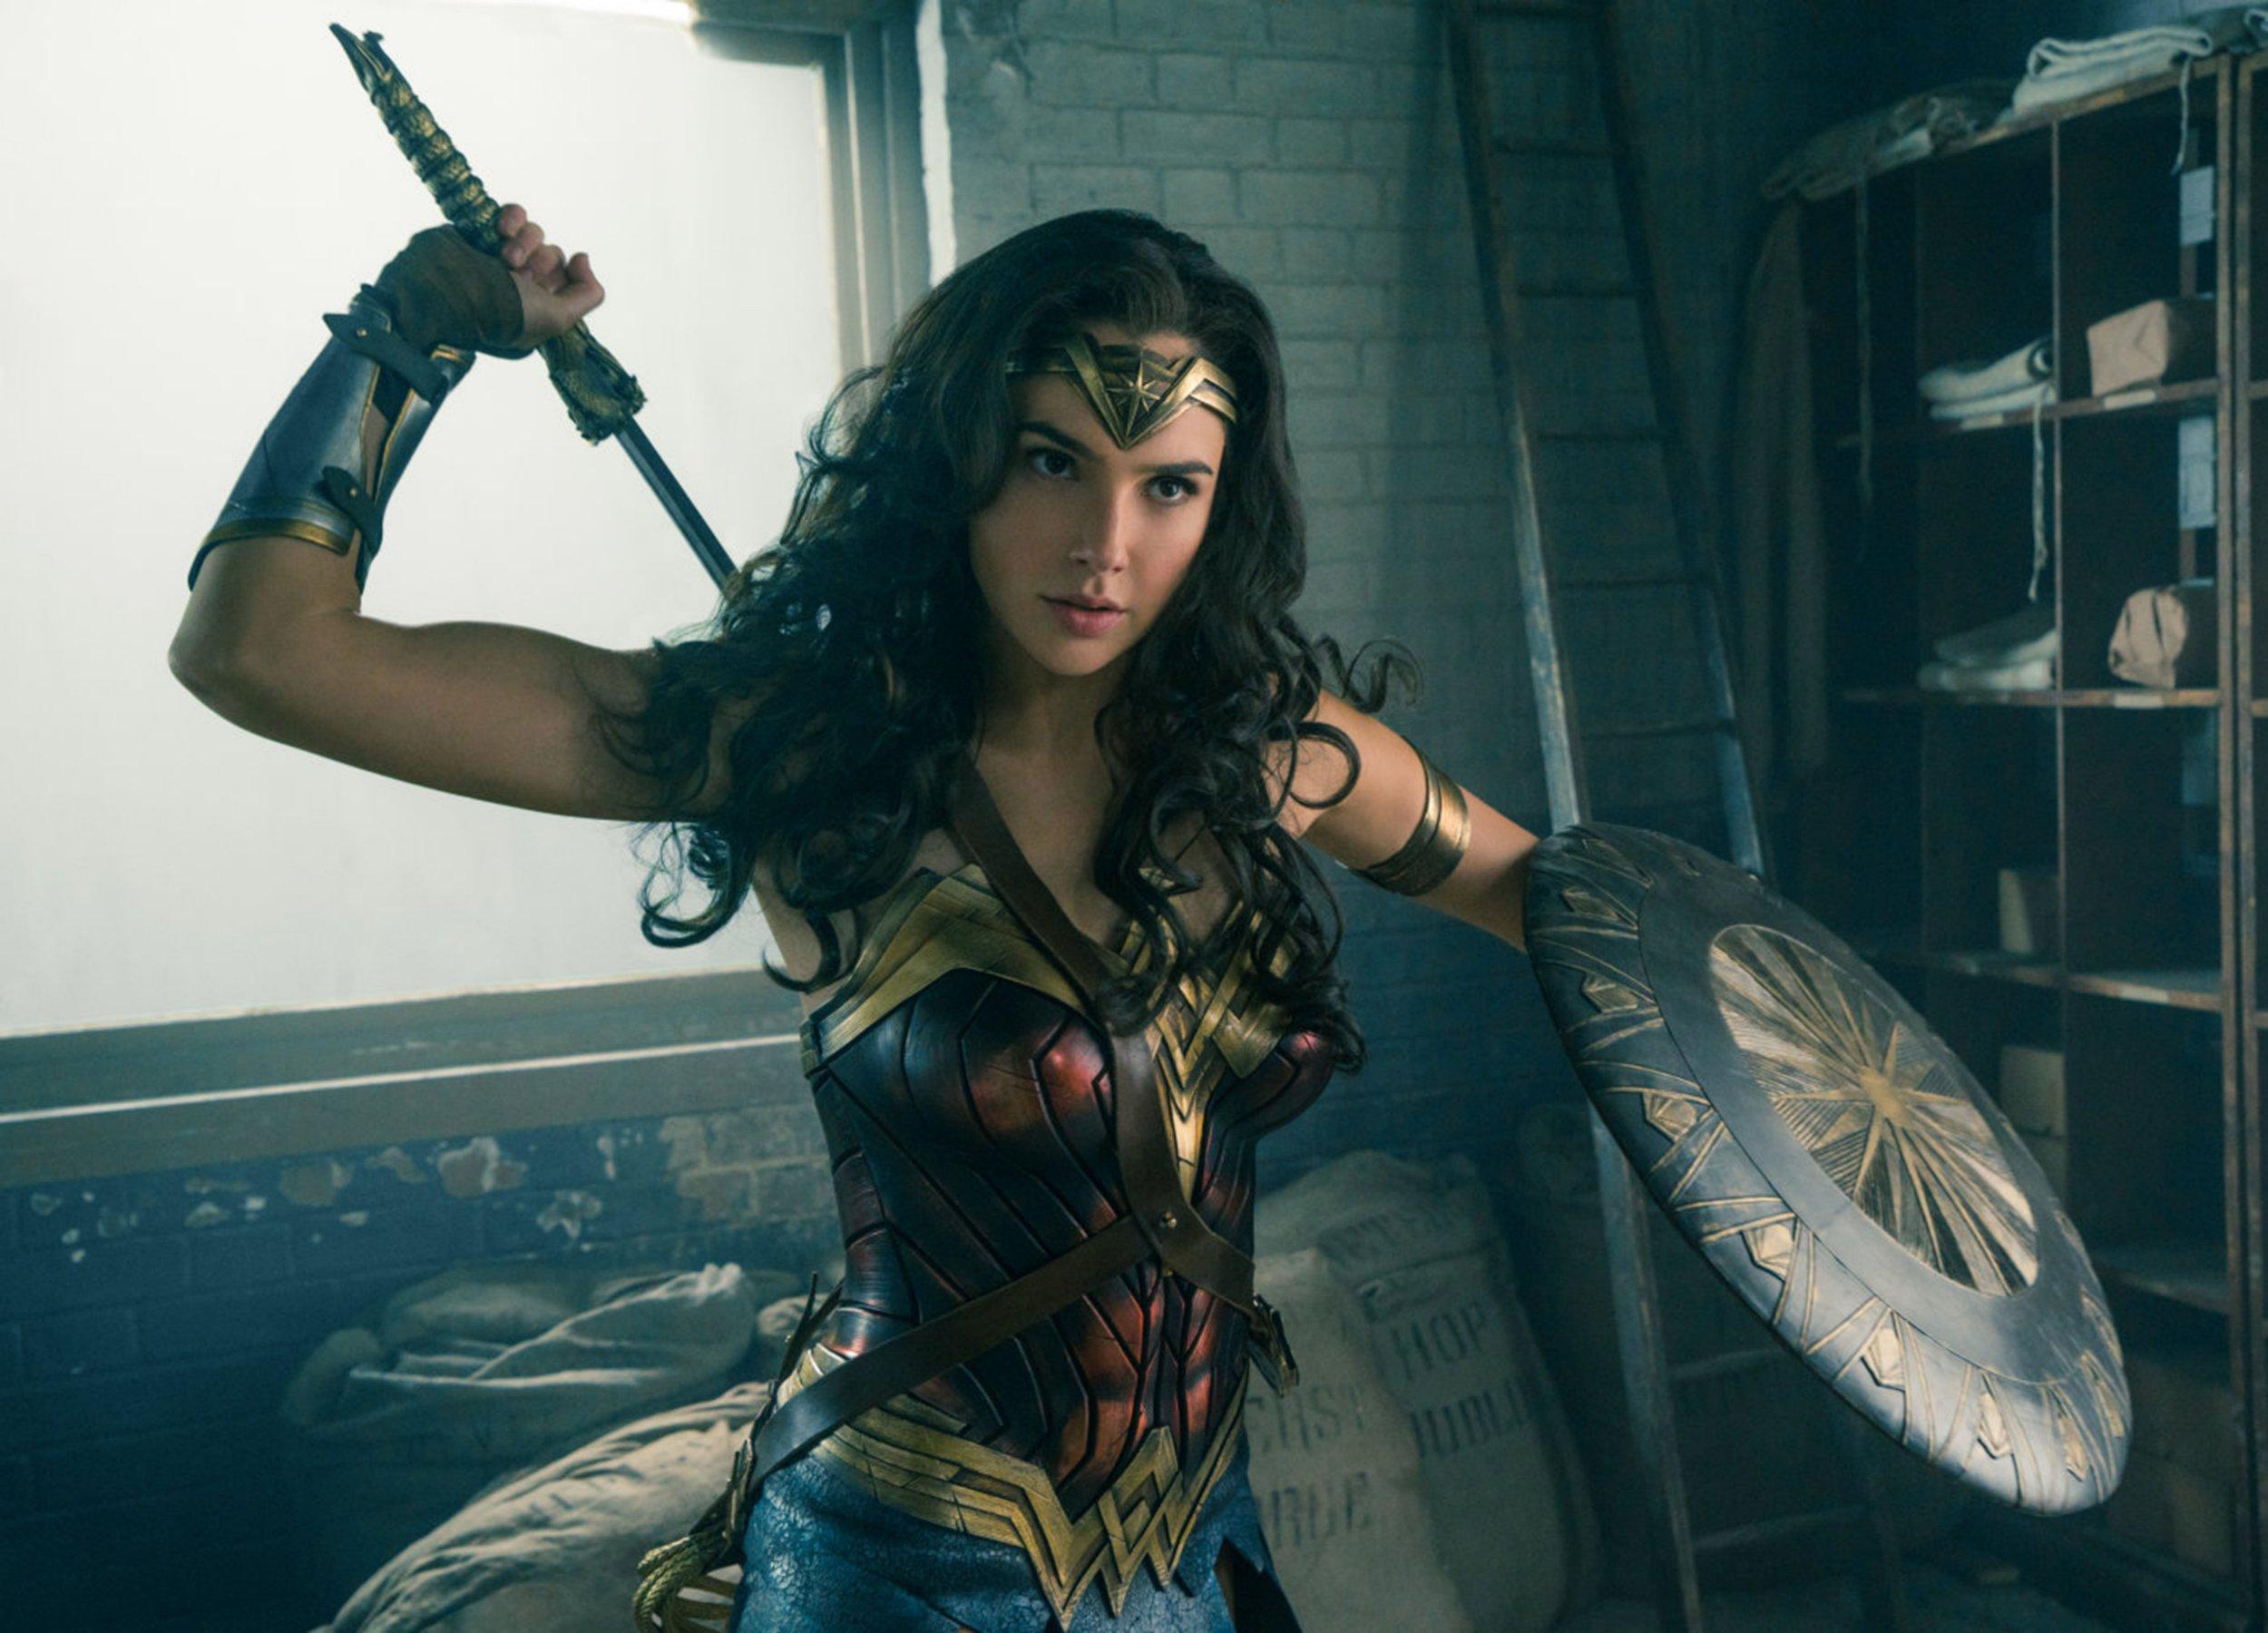 Gal Gadot confirms Wonder Woman 1984 has been pushed back until summer 2020